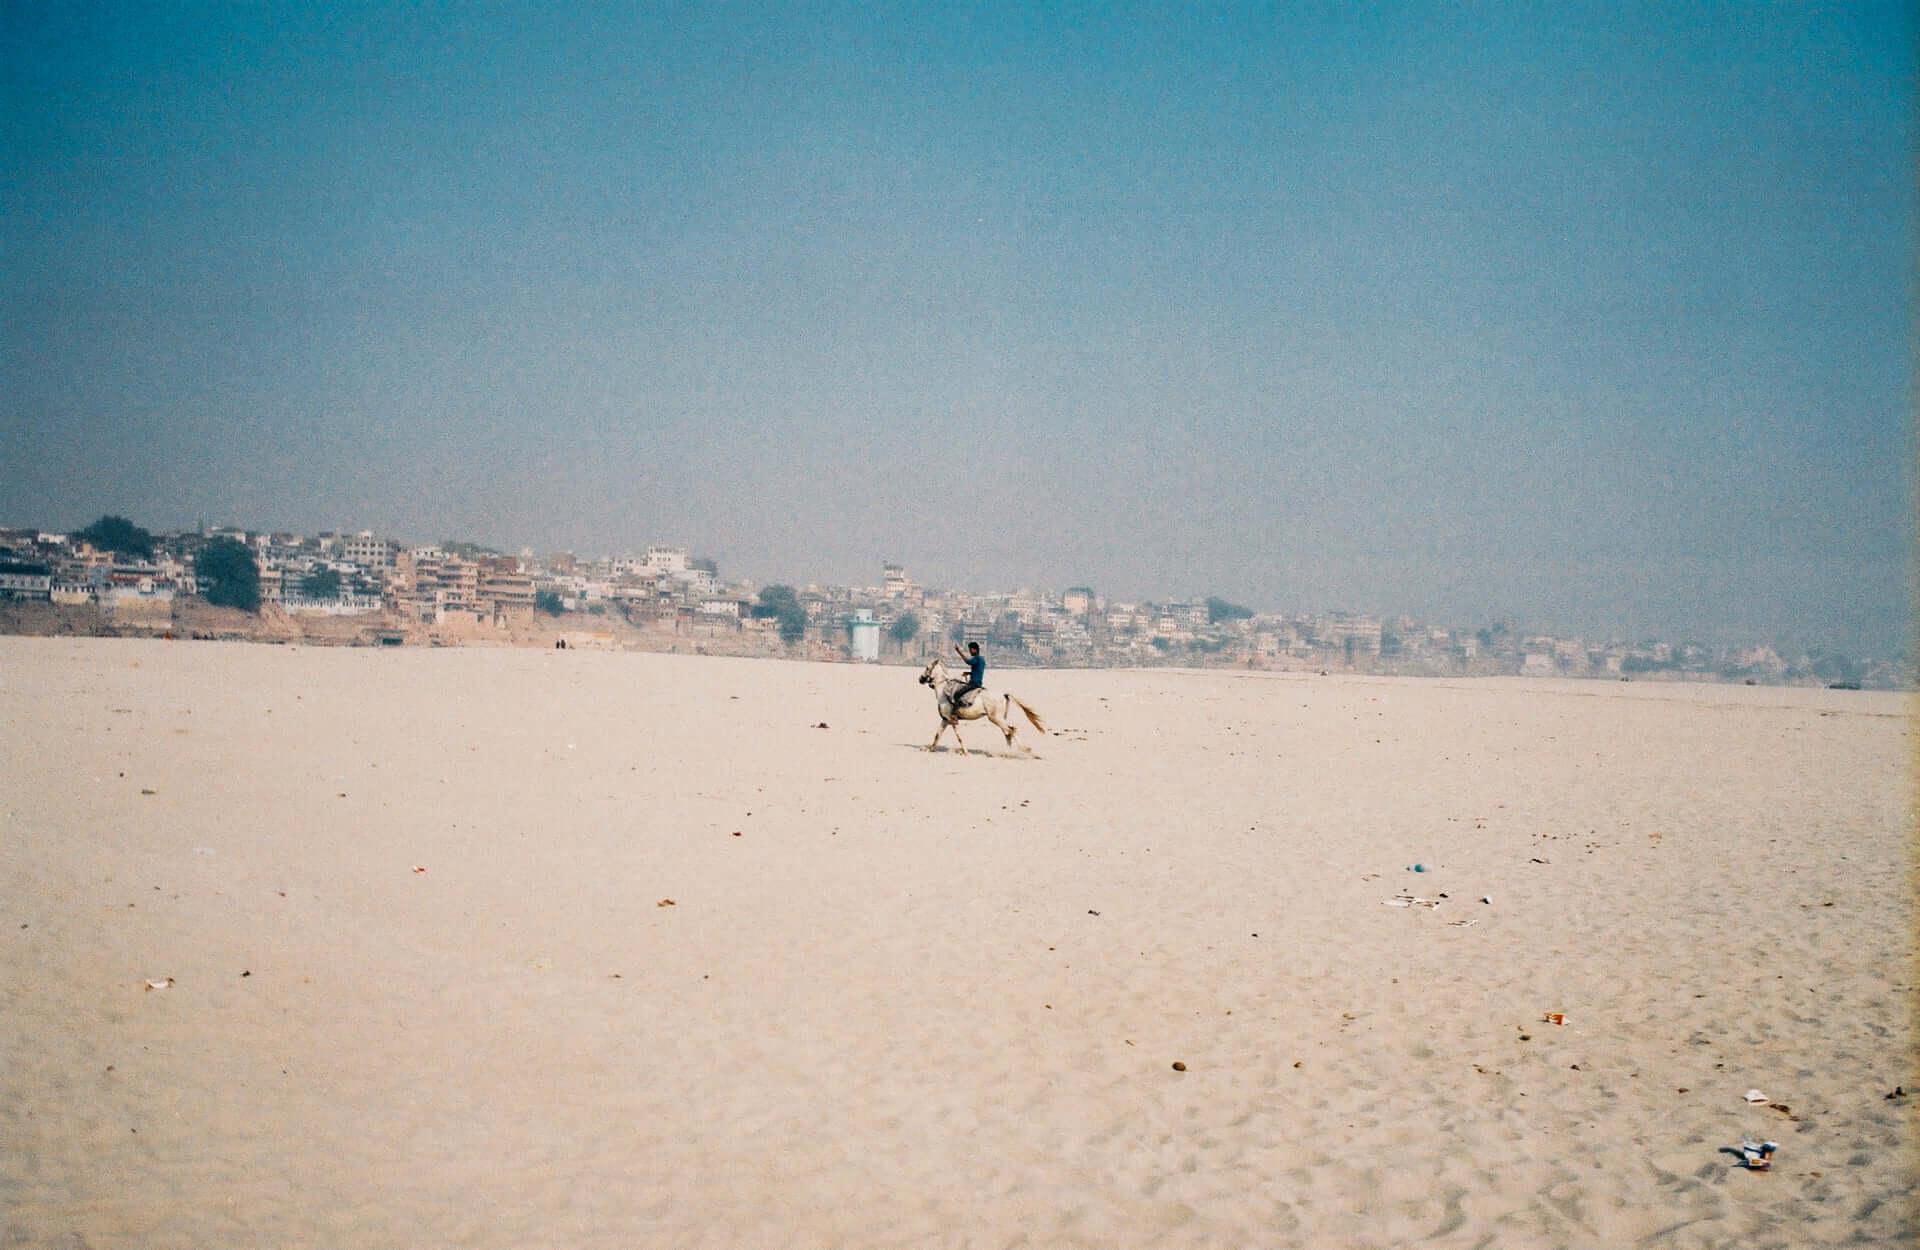 Gateballers ×写真家・相澤有紀、インド旅をまとめたドキュメンタリーブック創刊|Campfireでのプロジェクトがスタート art190723_gateballers_7-1920x1250